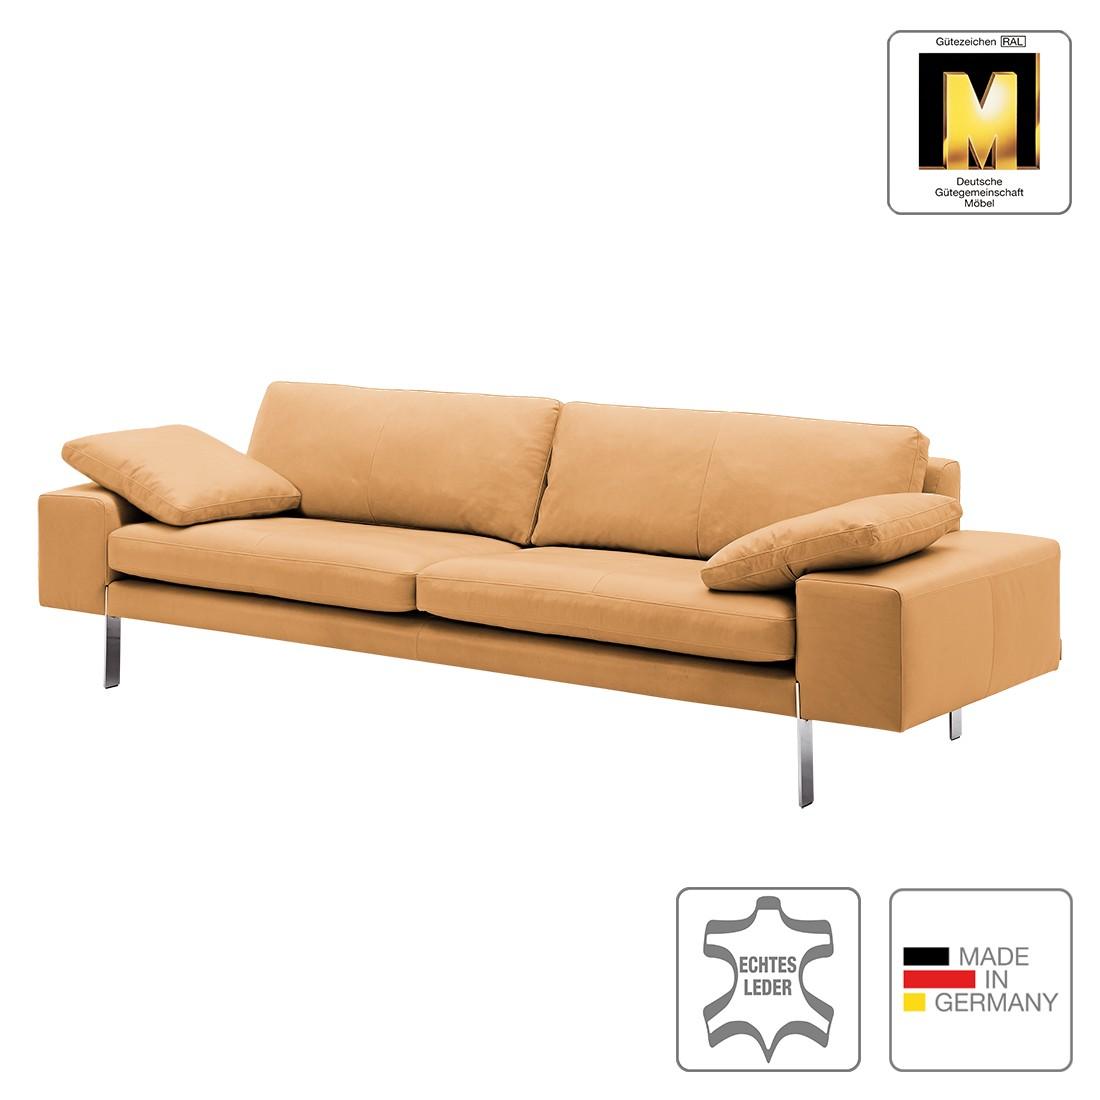 sofa topal 4 sitzer echtleder cognac 2 kissen machalke polsterwerkst tten g nstig. Black Bedroom Furniture Sets. Home Design Ideas